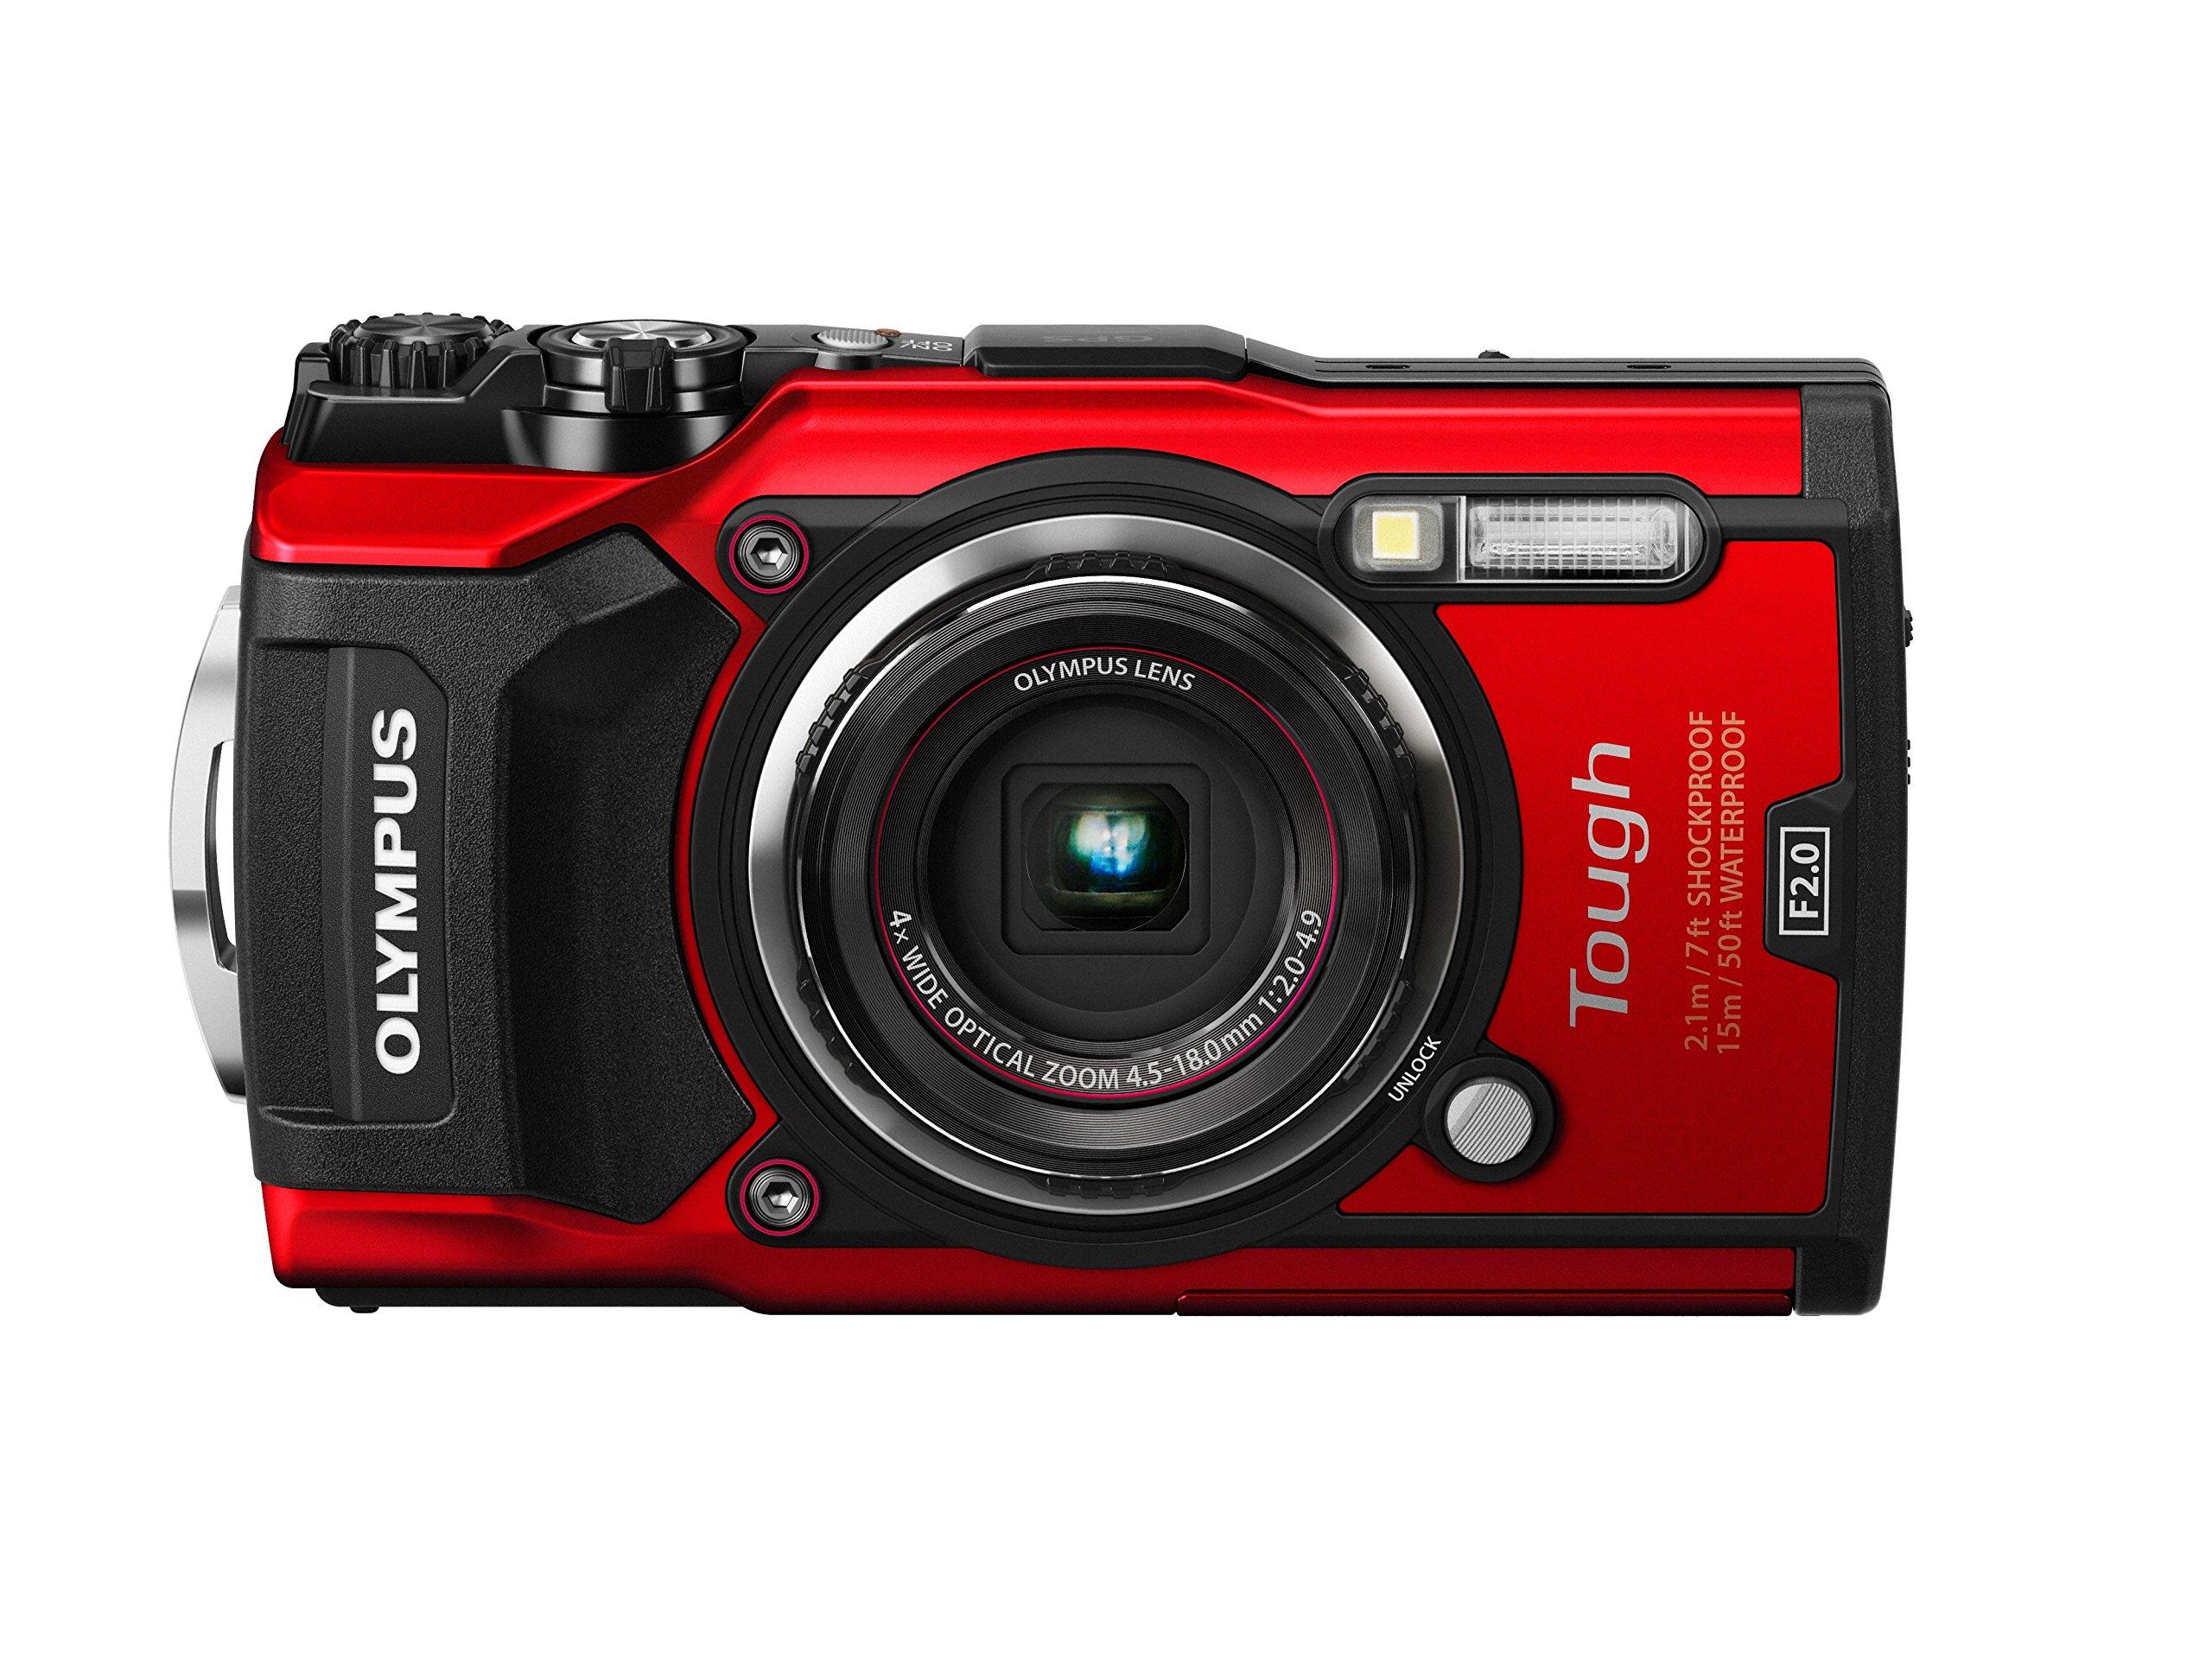 Olympus TG-5 Waterproof Camera with 3-Inch LCD, Red (V104190RU000) by Olympus